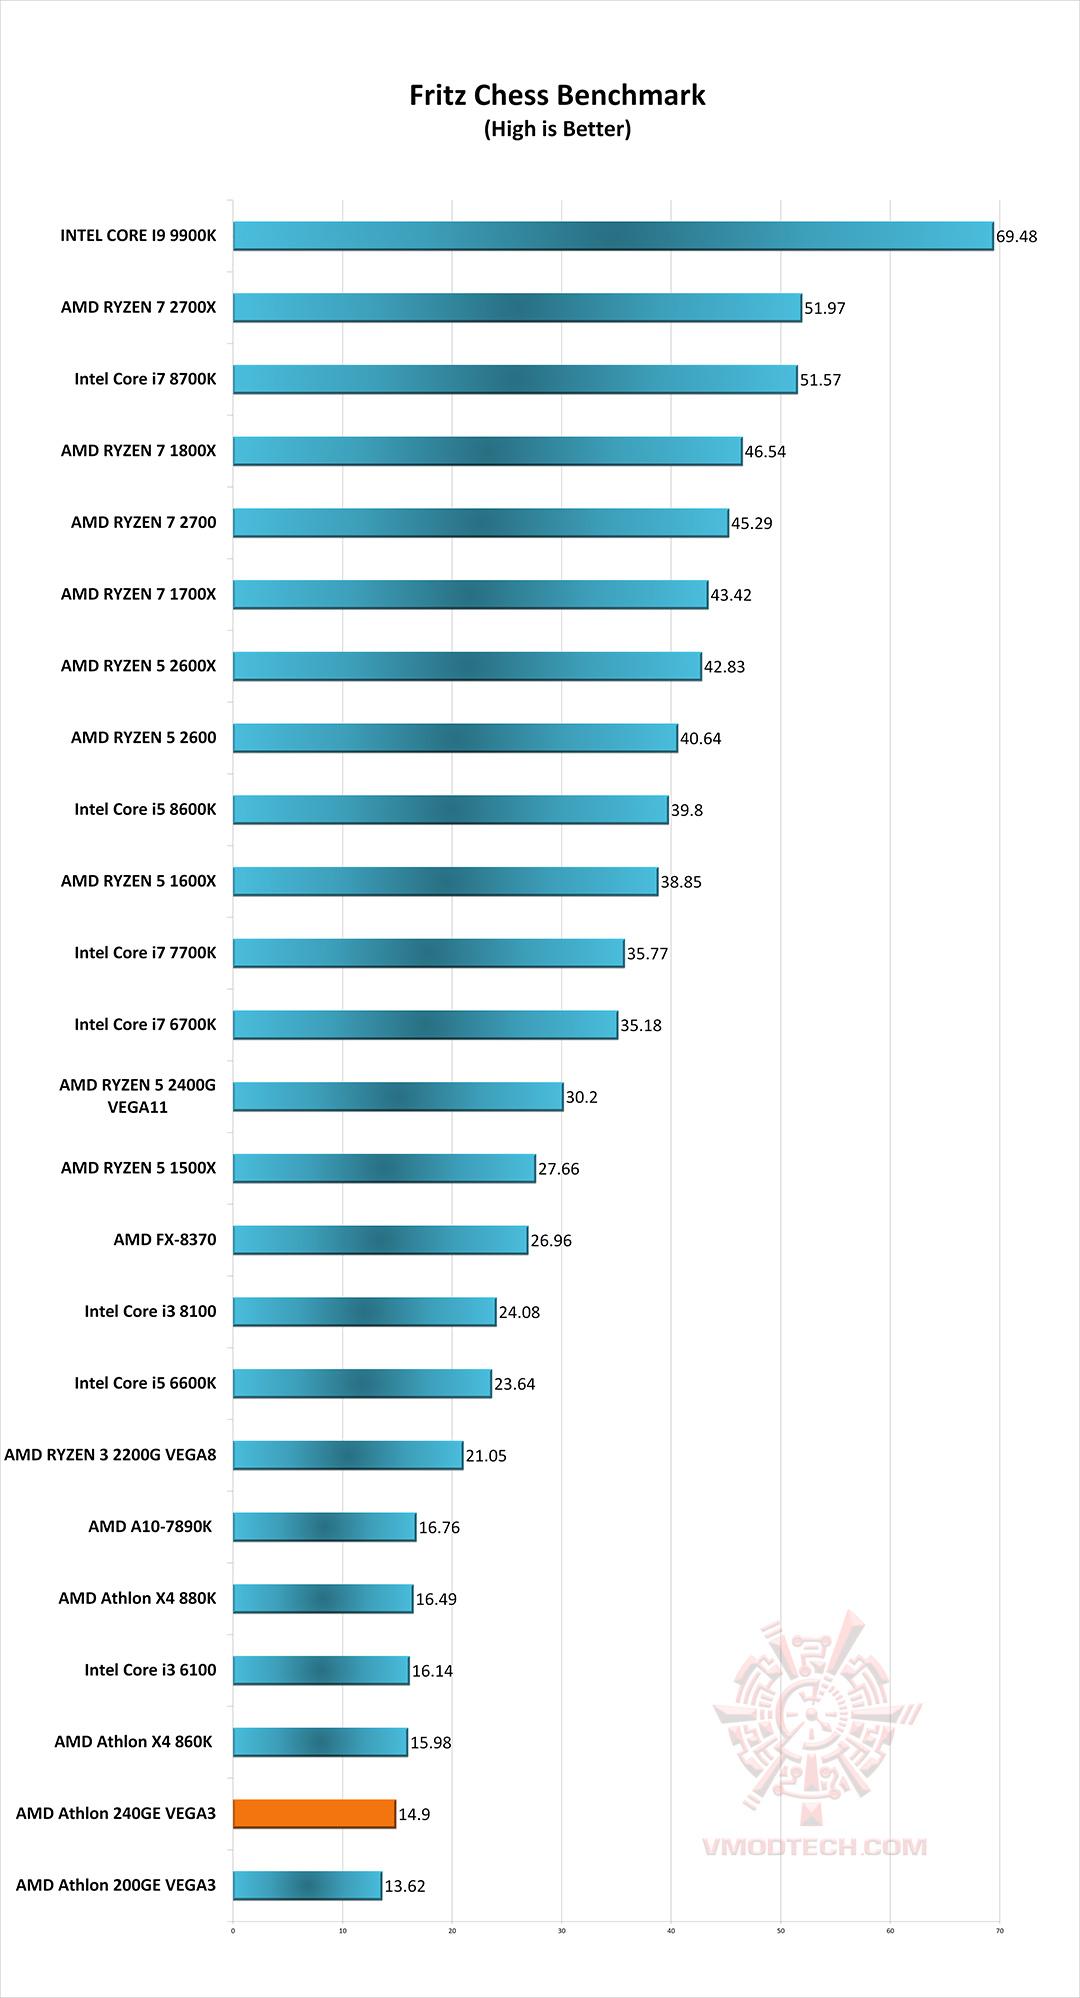 friyz g AMD Athlon 240GE Processor with Radeon Vega 3 Graphics Review